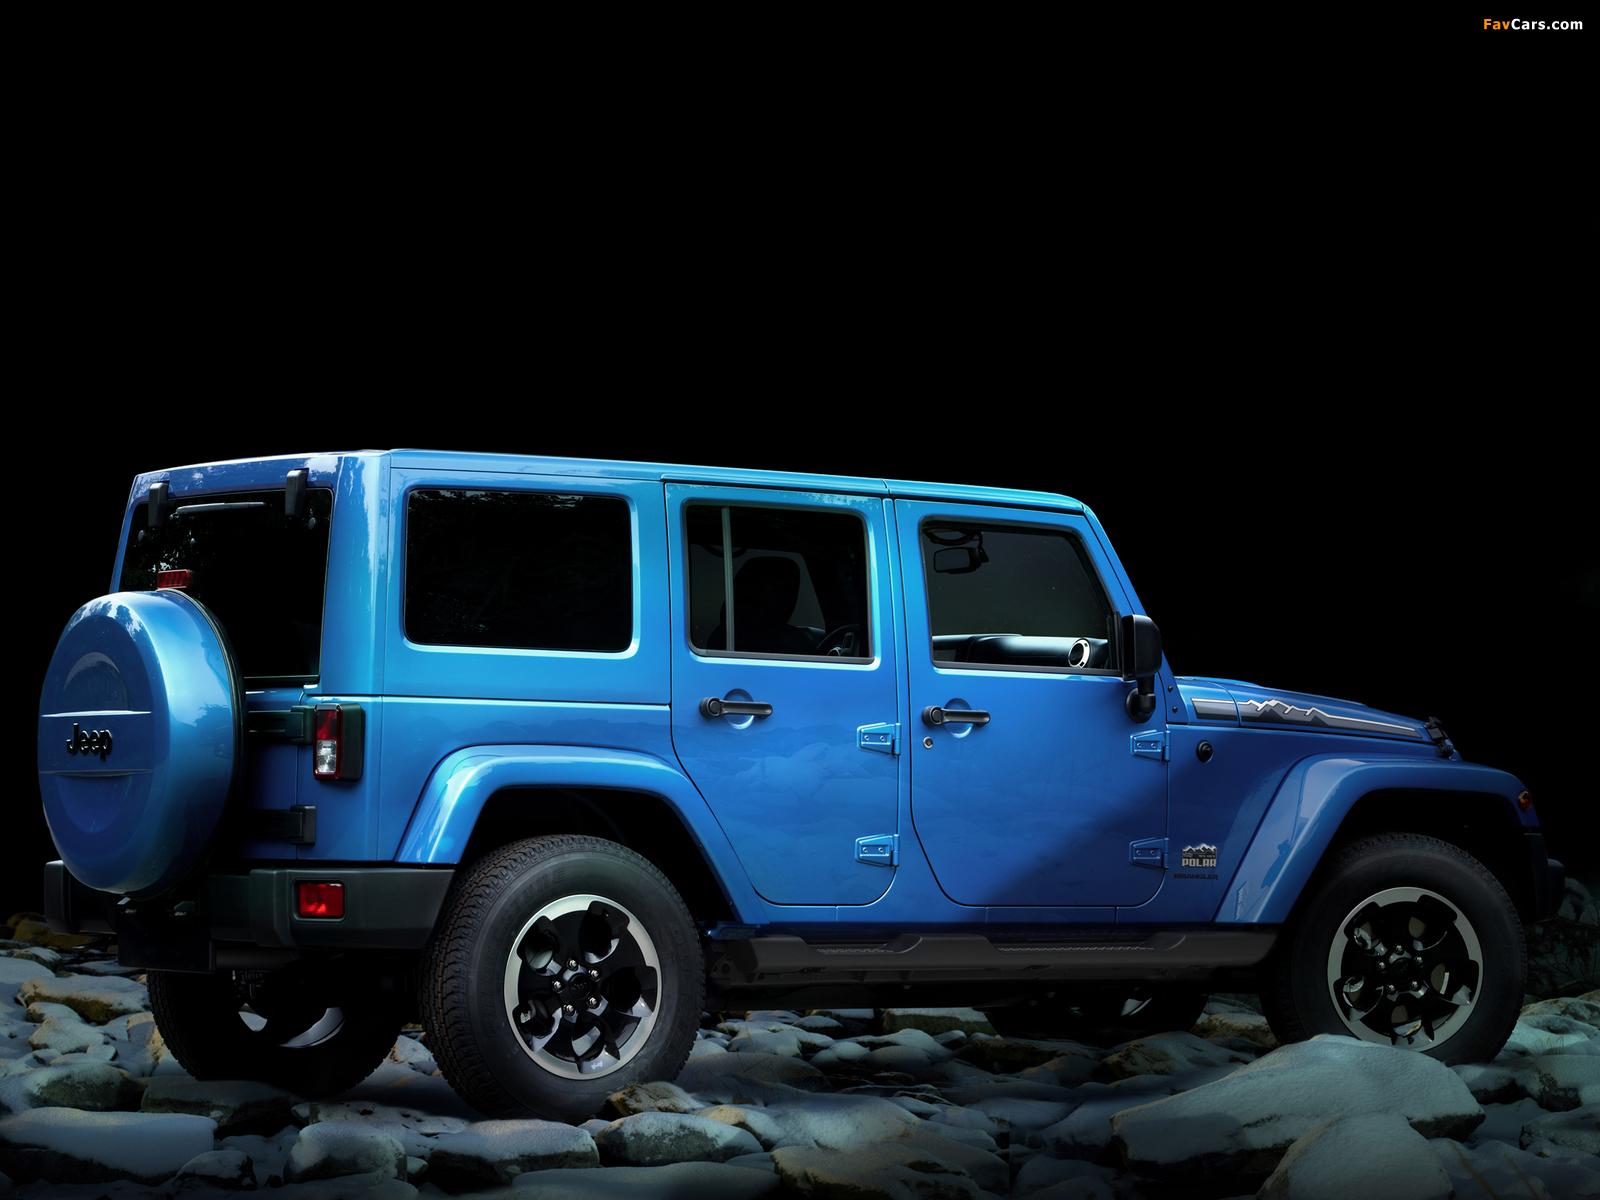 Jeep Wrangler Unlimited Polar (JK) 2014 images (1600 x 1200)